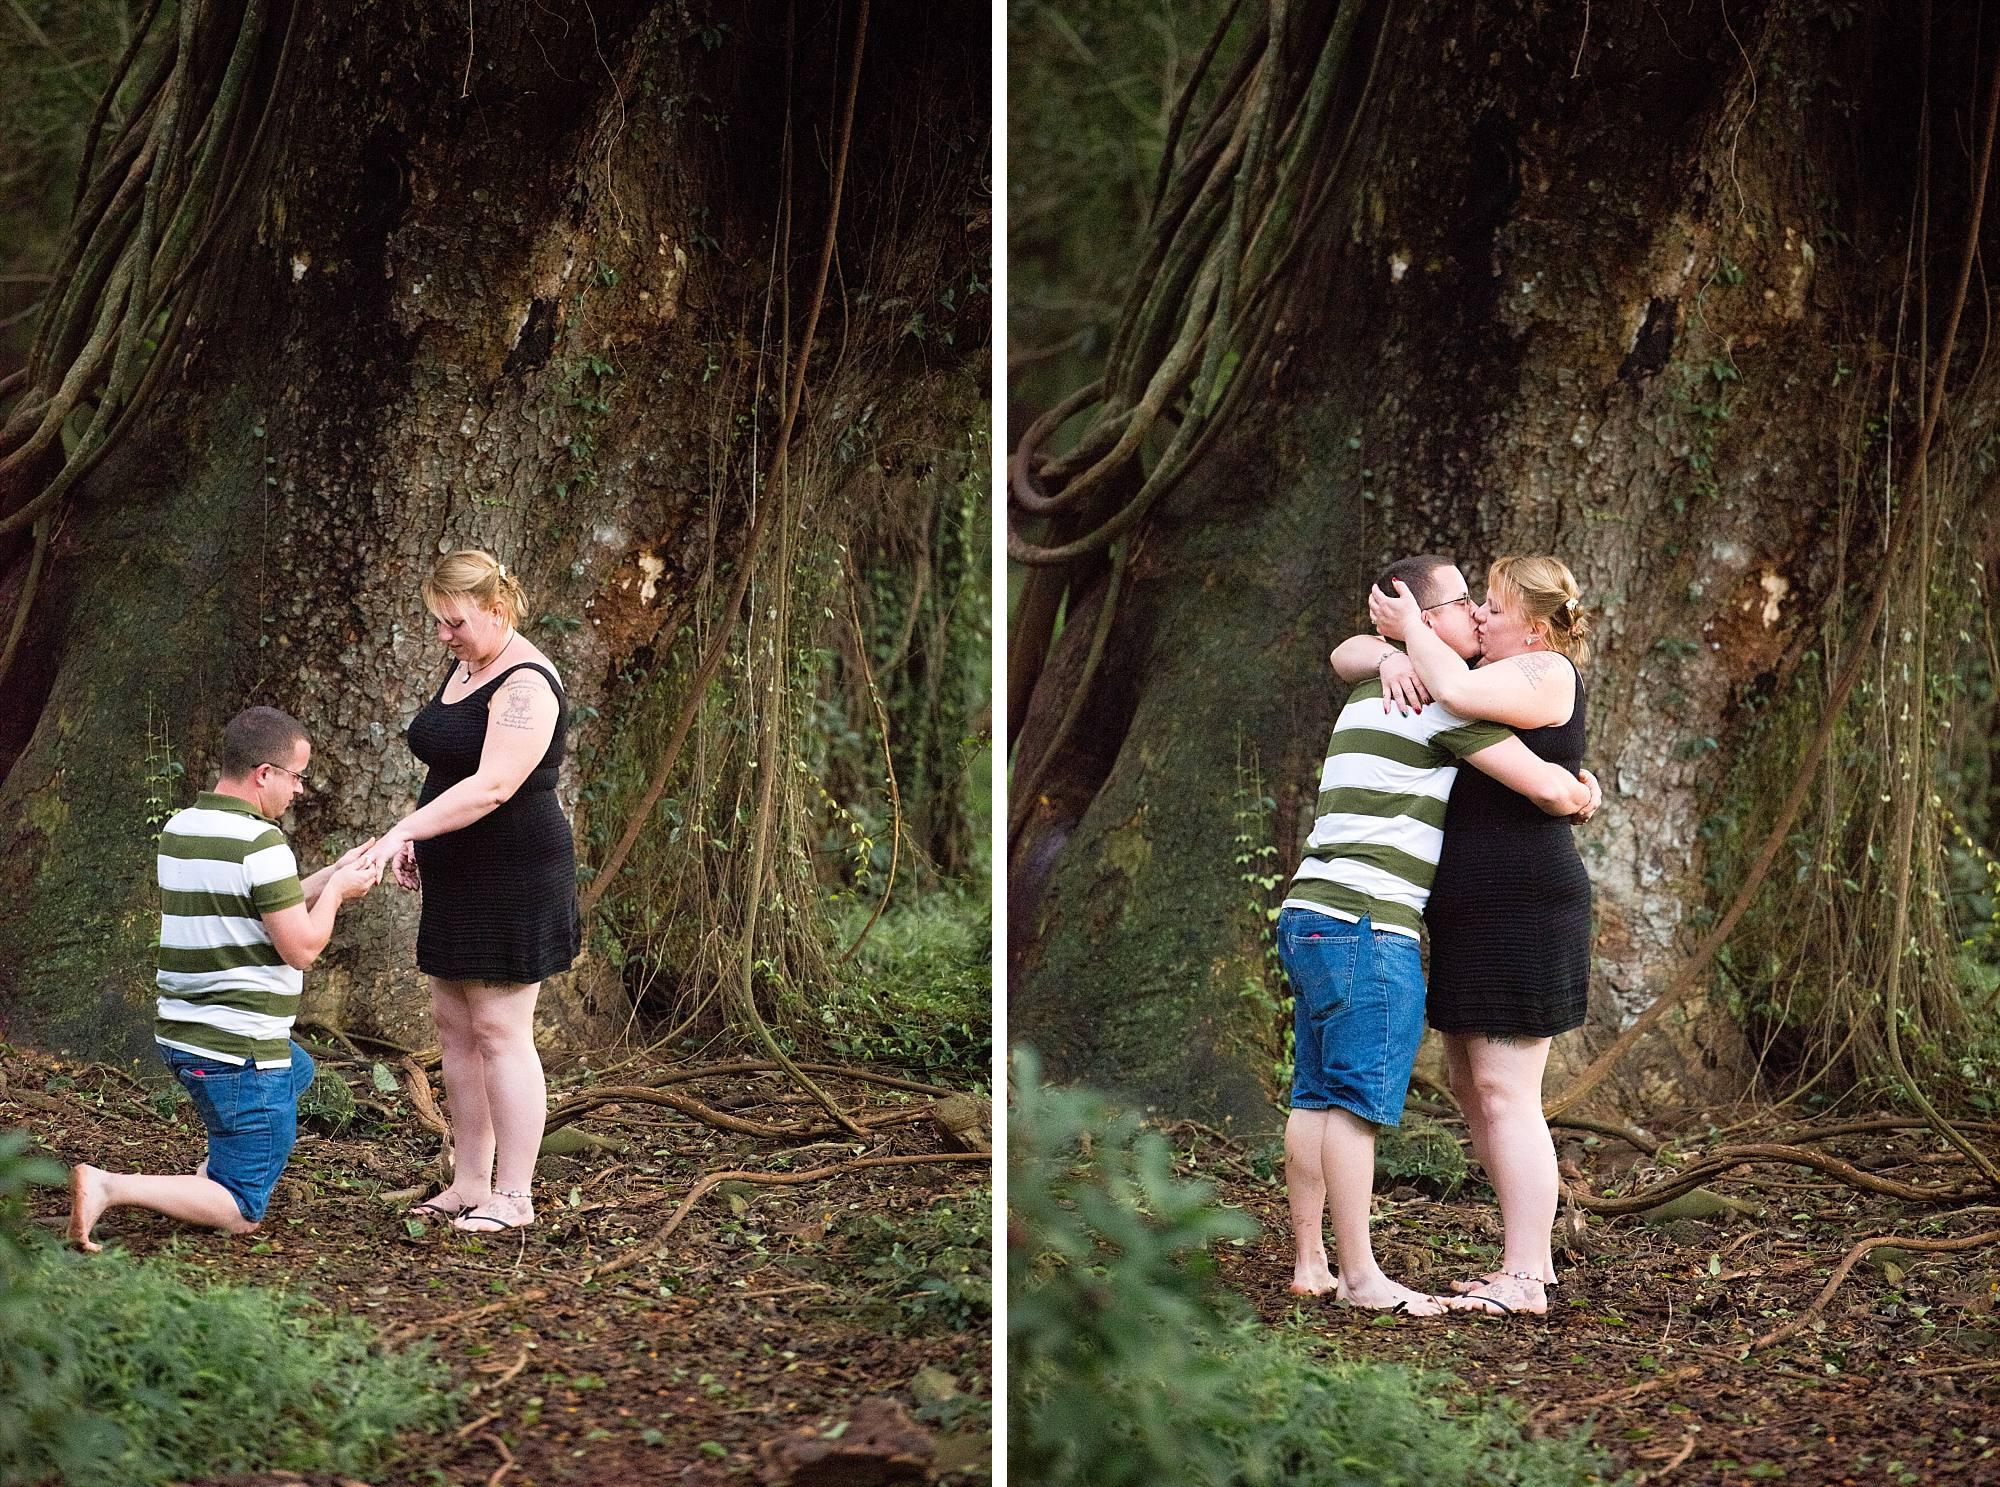 proposal shots she said yes